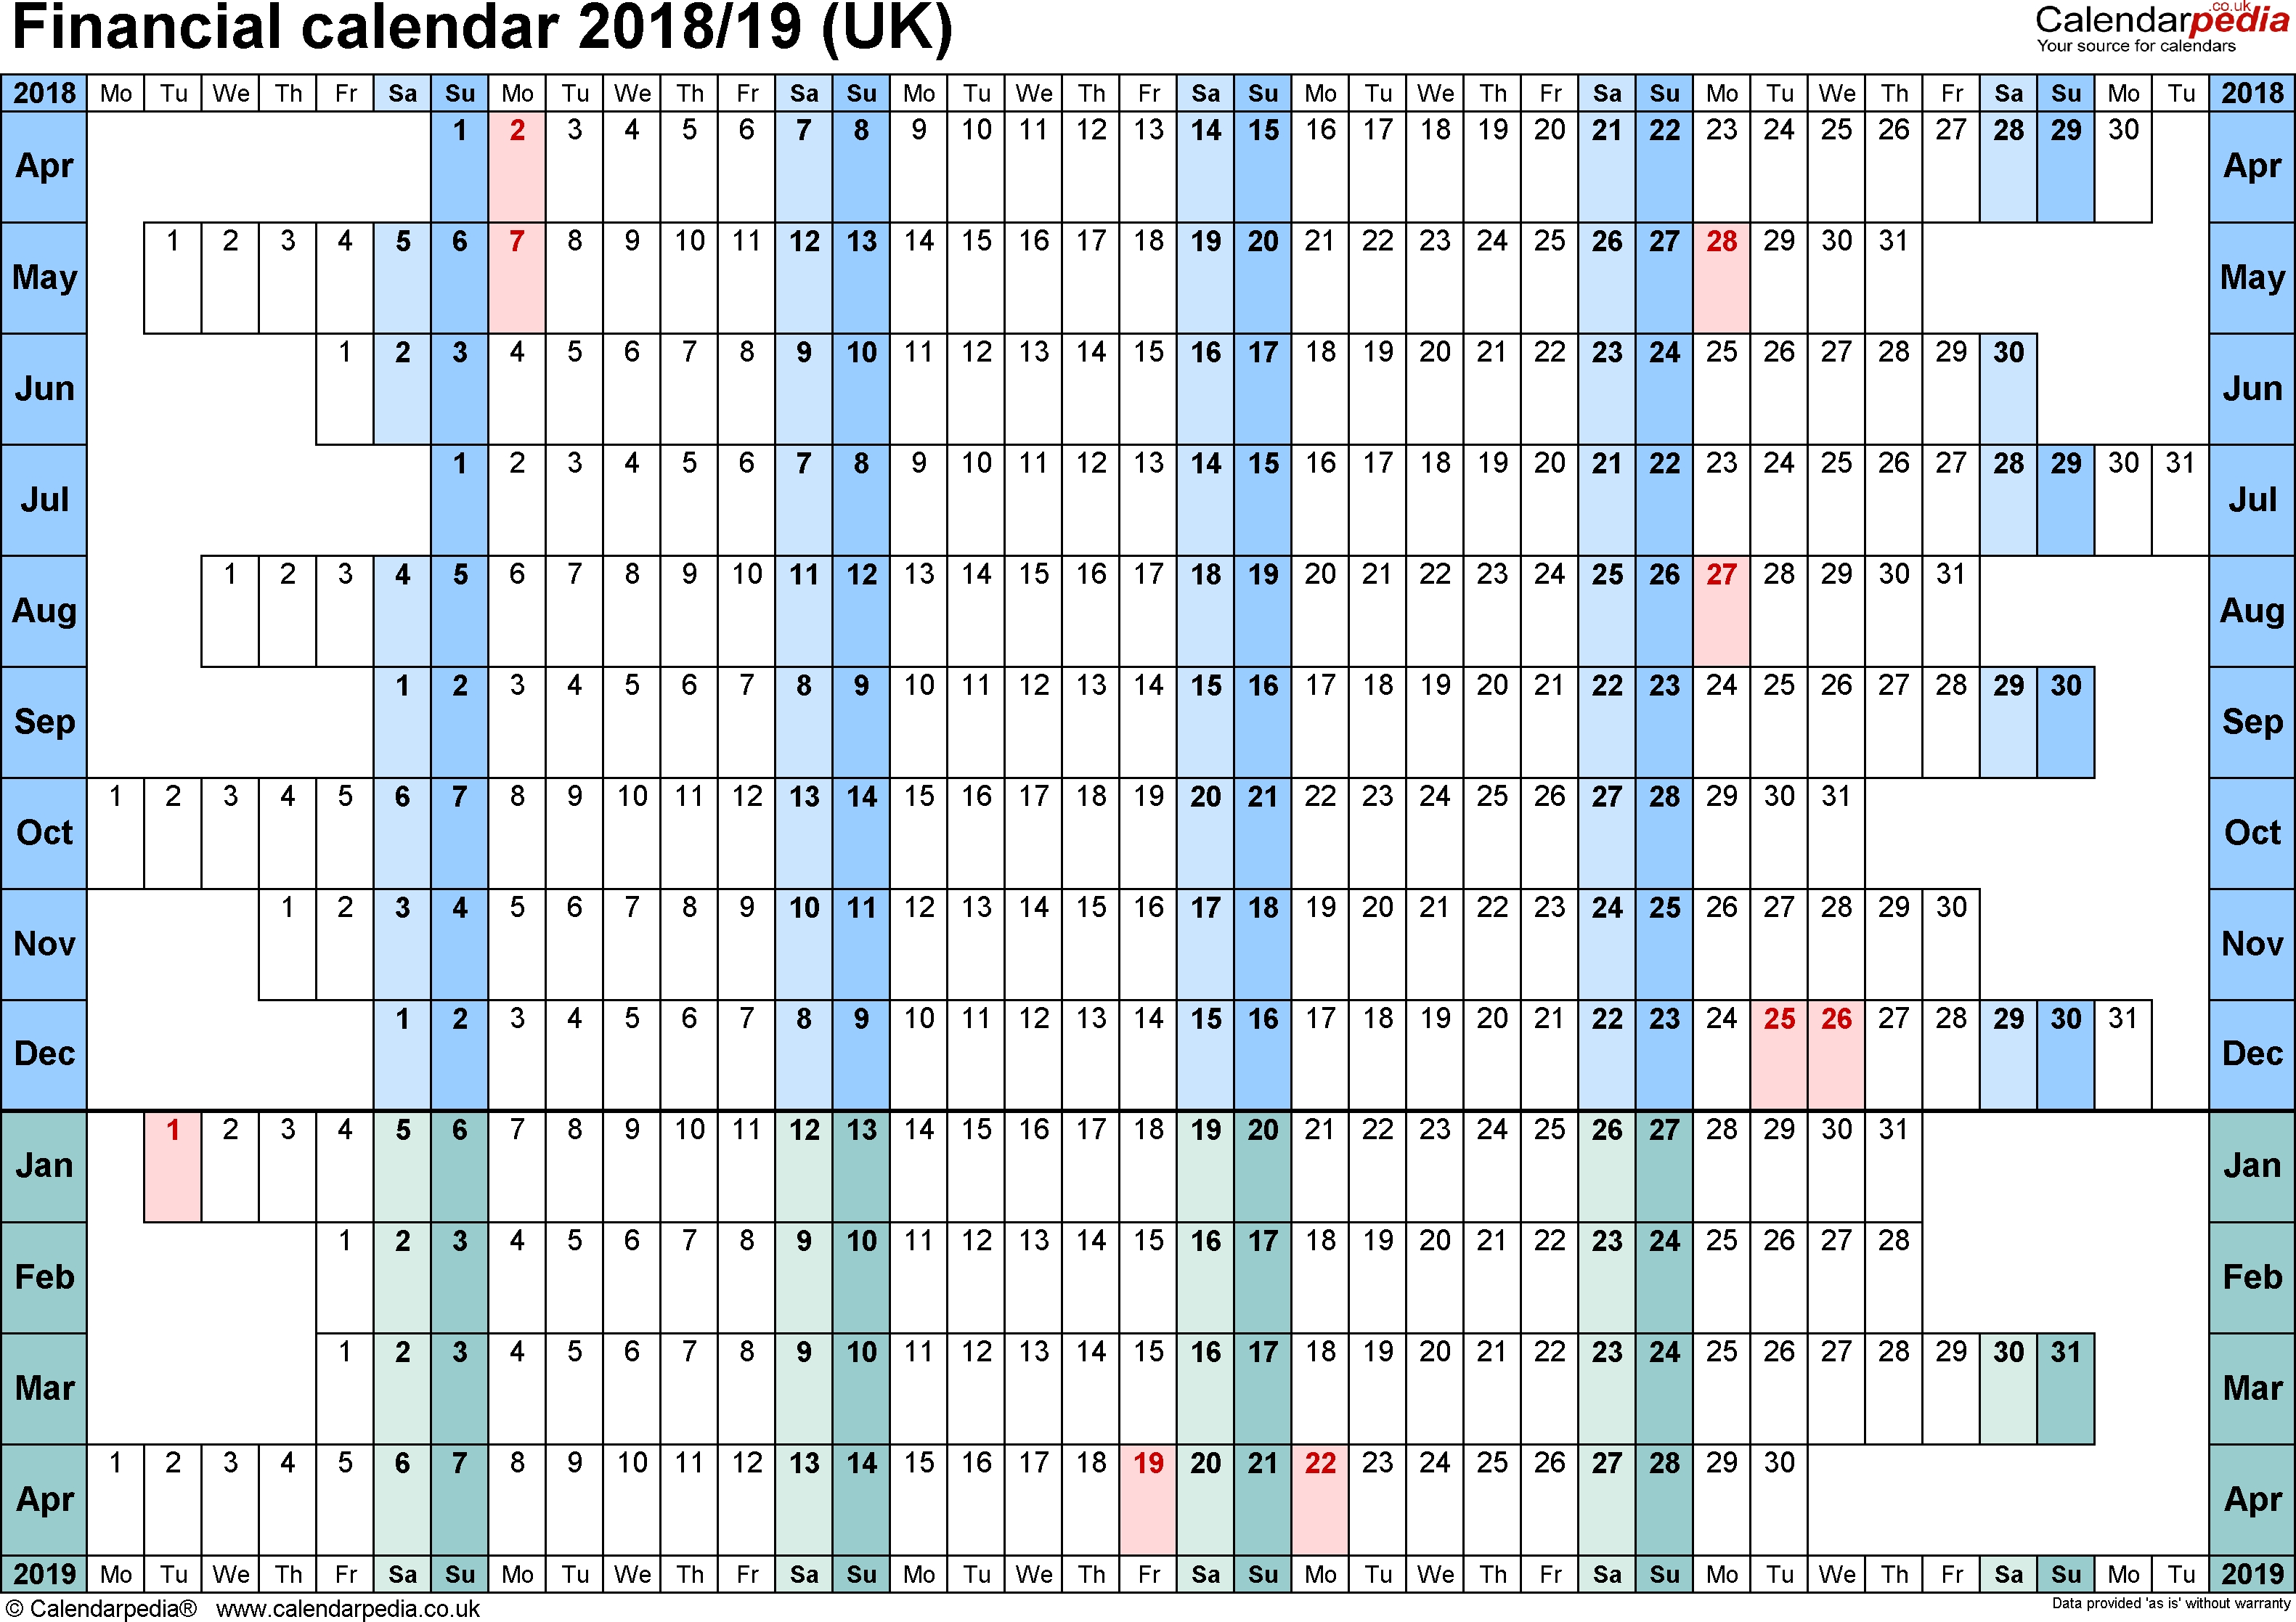 Financial Calendars 2018/19 (Uk) In Pdf Format  Network Rail Calendar Week Numbers